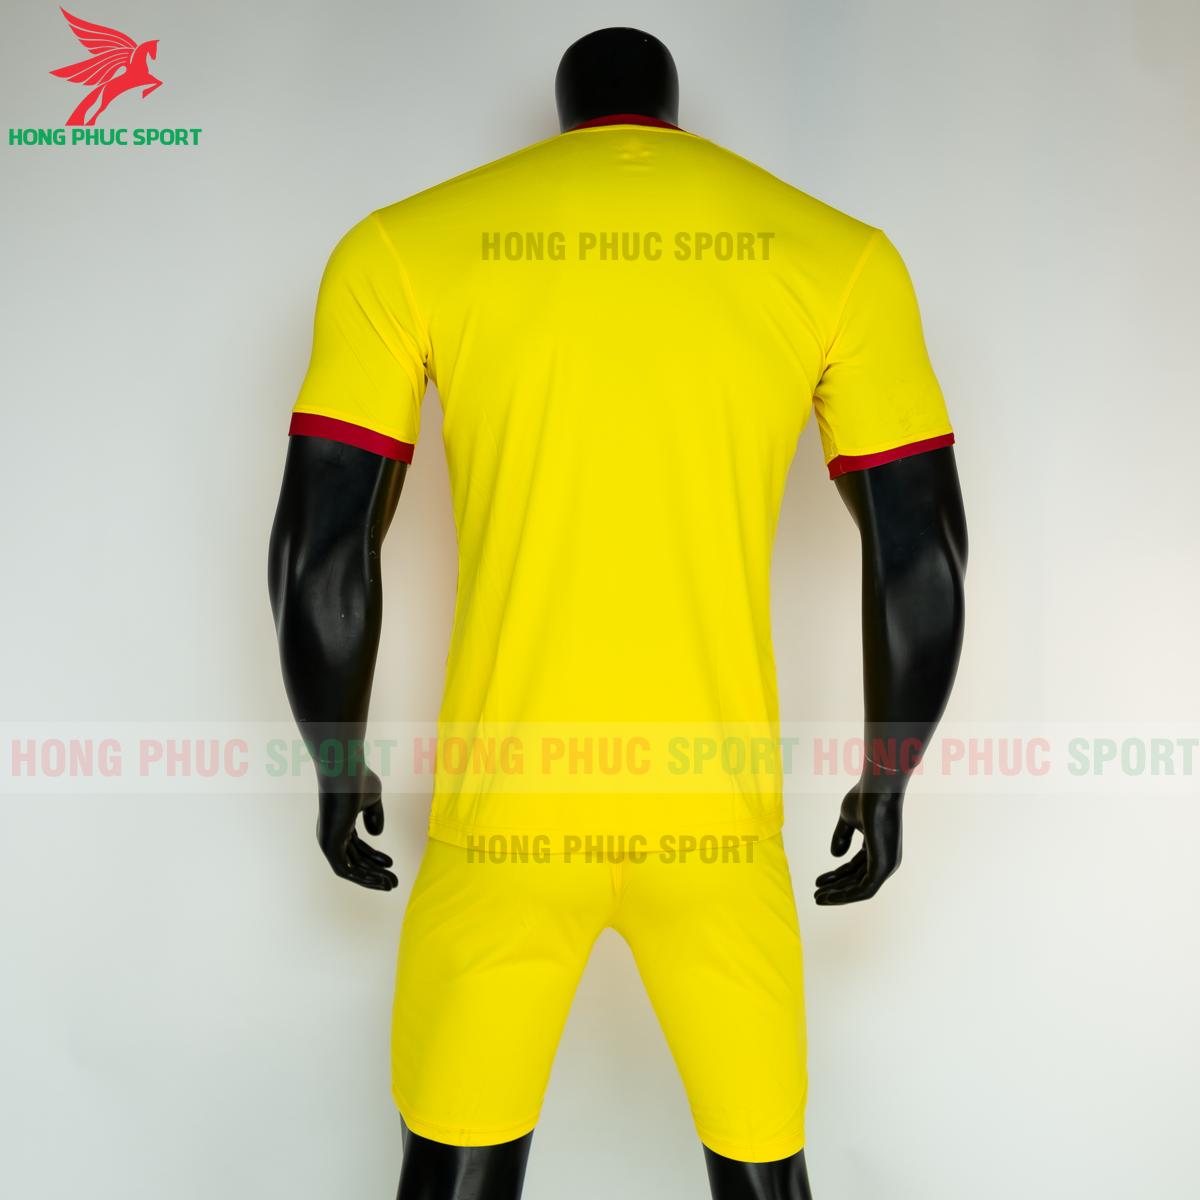 https://cdn.hongphucsport.com/unsafe/s4.shopbay.vn/files/285/ao-bong-da-thu-mon-viet-nam-2021-san-khach-8-60503968eaeae.png